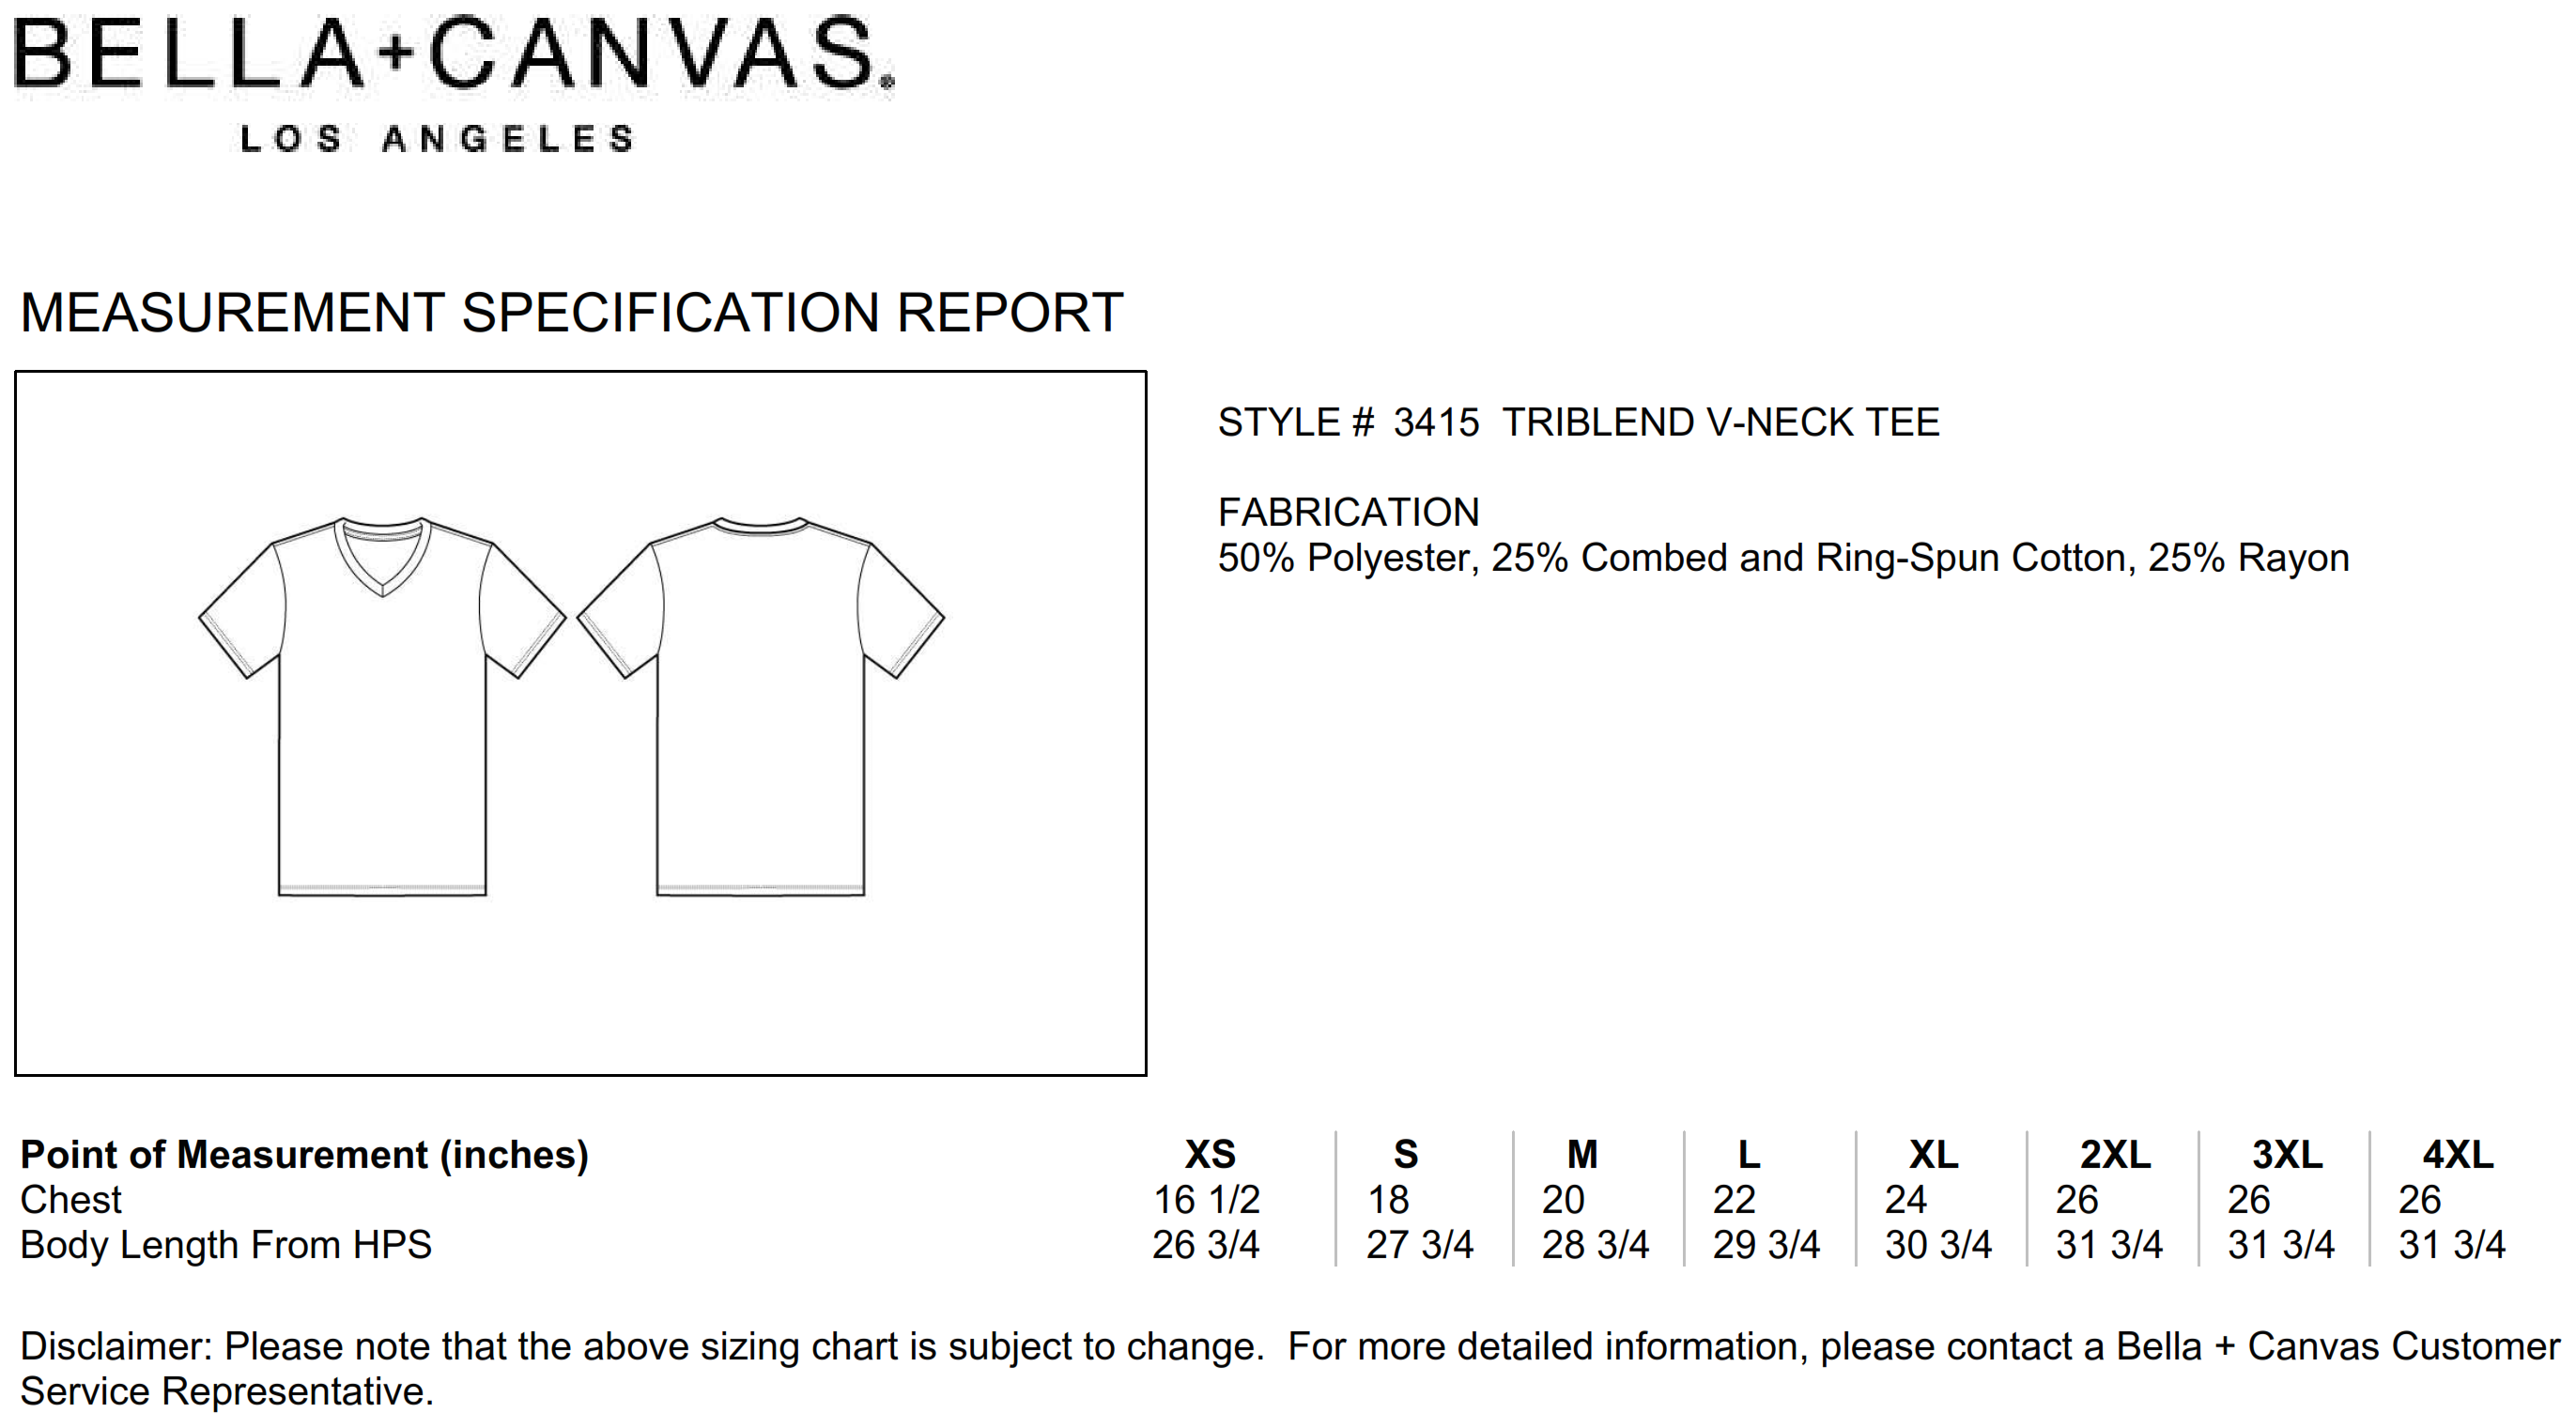 Bella+Canvas: Unisex Triblend V-Neck T-Shirt 3415